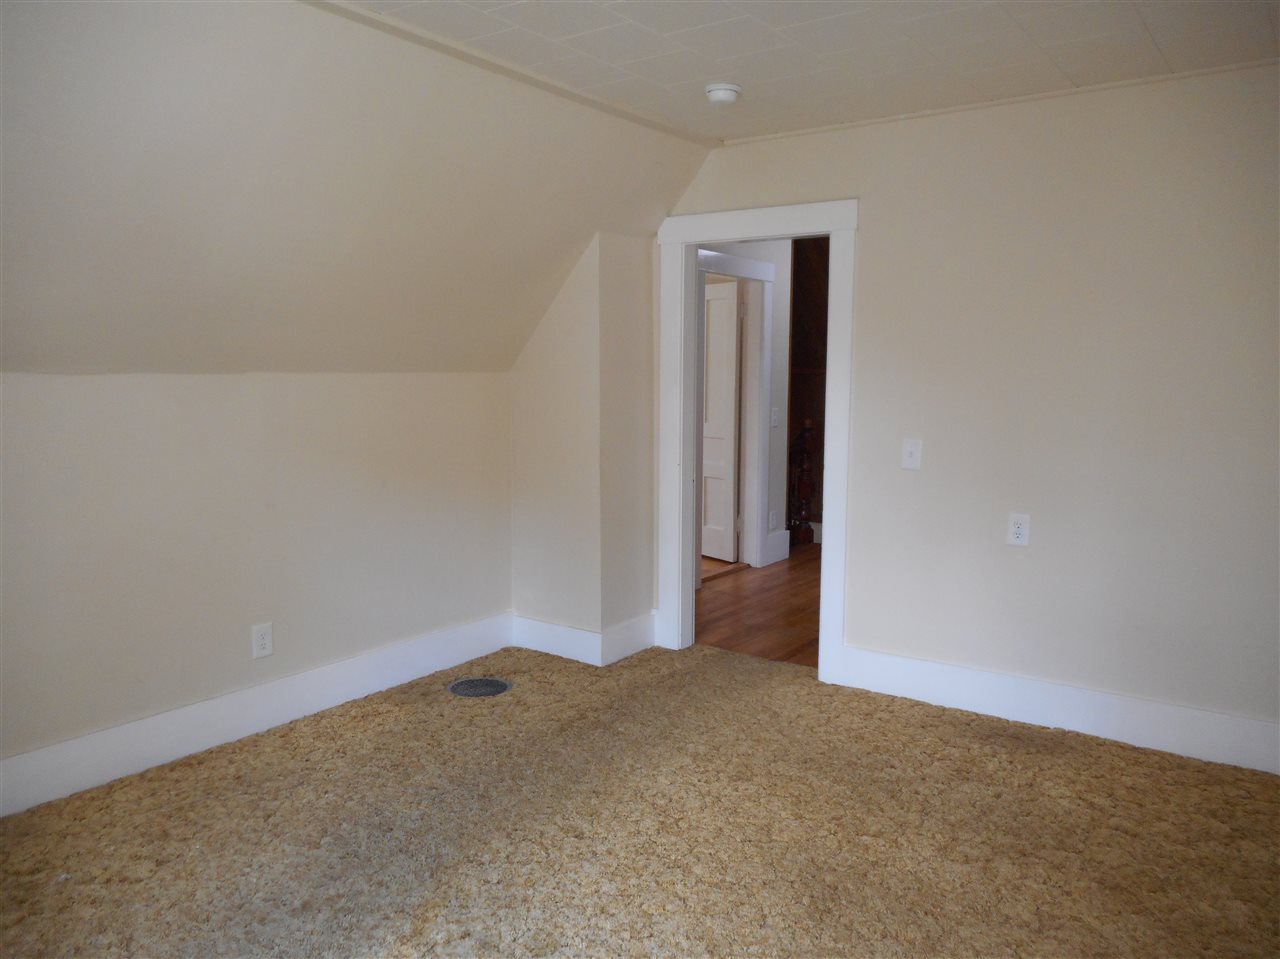 Vermont-Real-Estate-4651704-21